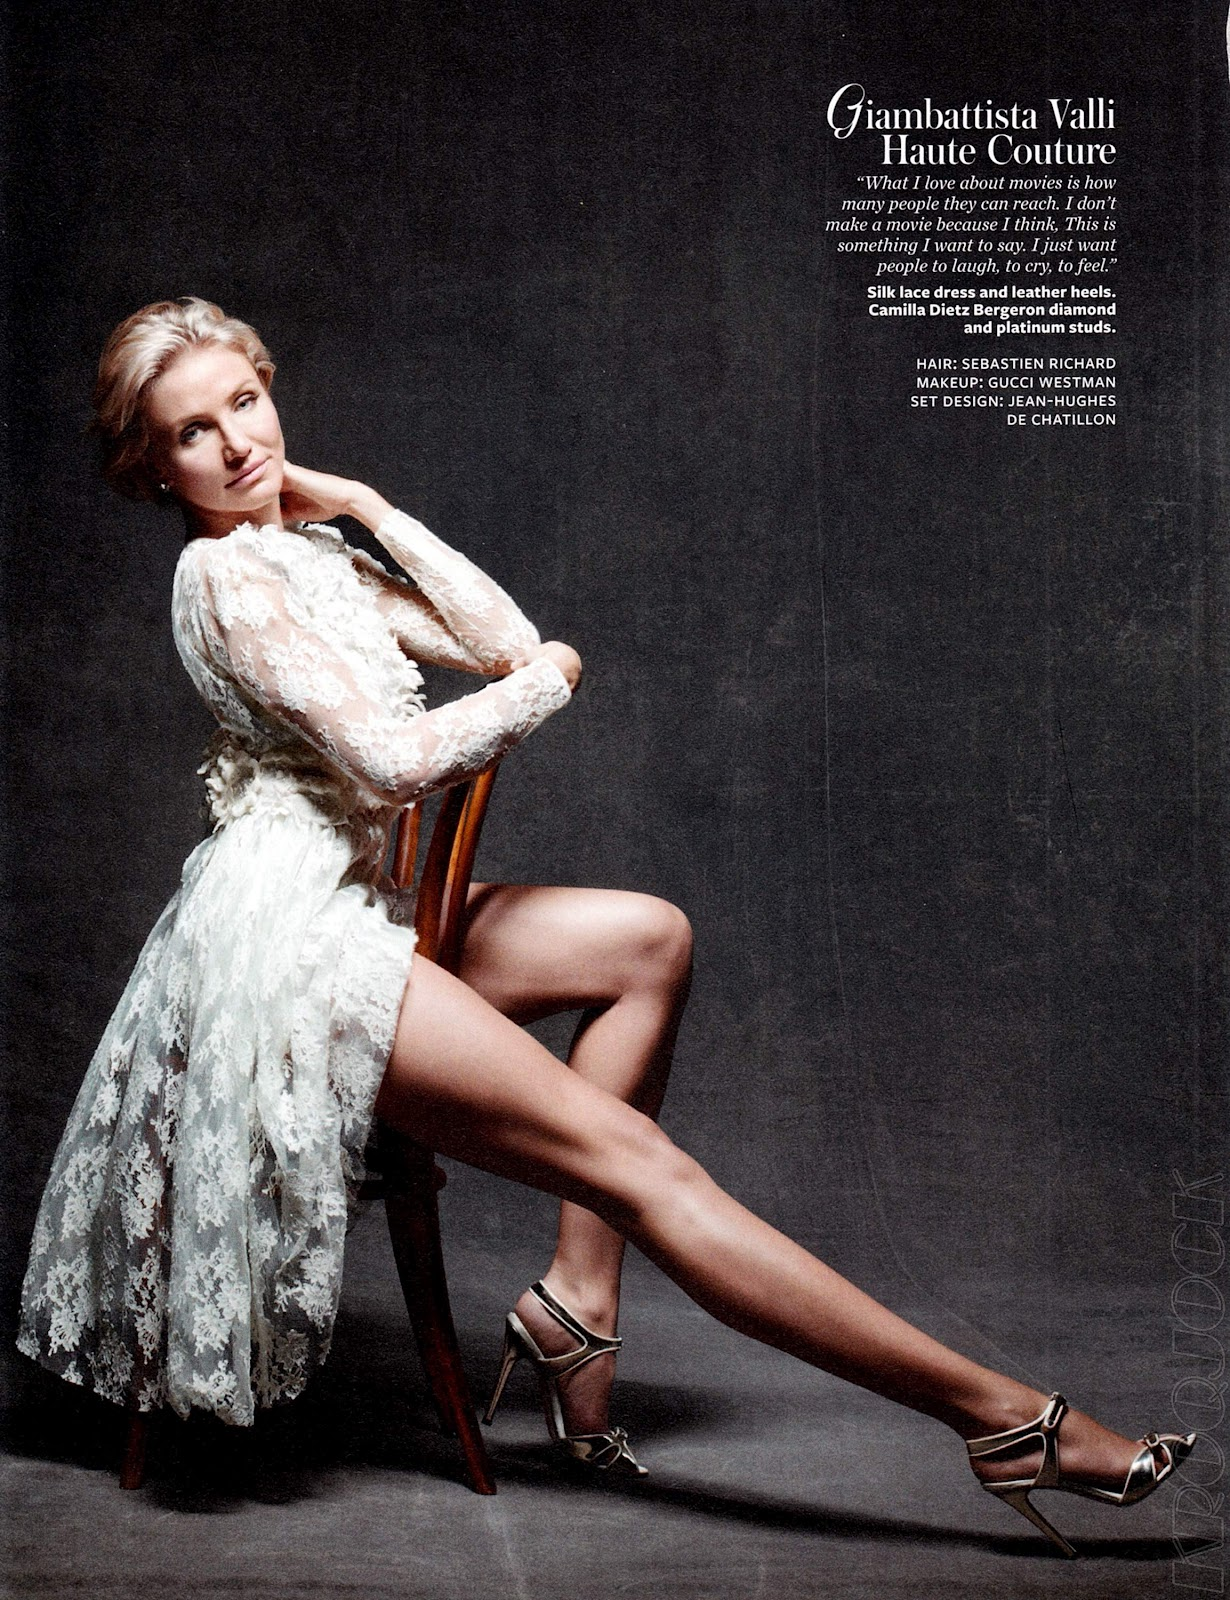 http://4.bp.blogspot.com/-8FFNCTGRRhs/T64I6F_qAqI/AAAAAAAAASs/V30ulJ1mNr8/s1600/Cameron-Diaz-InStyle-Photoshoot-legs-hot.jpg